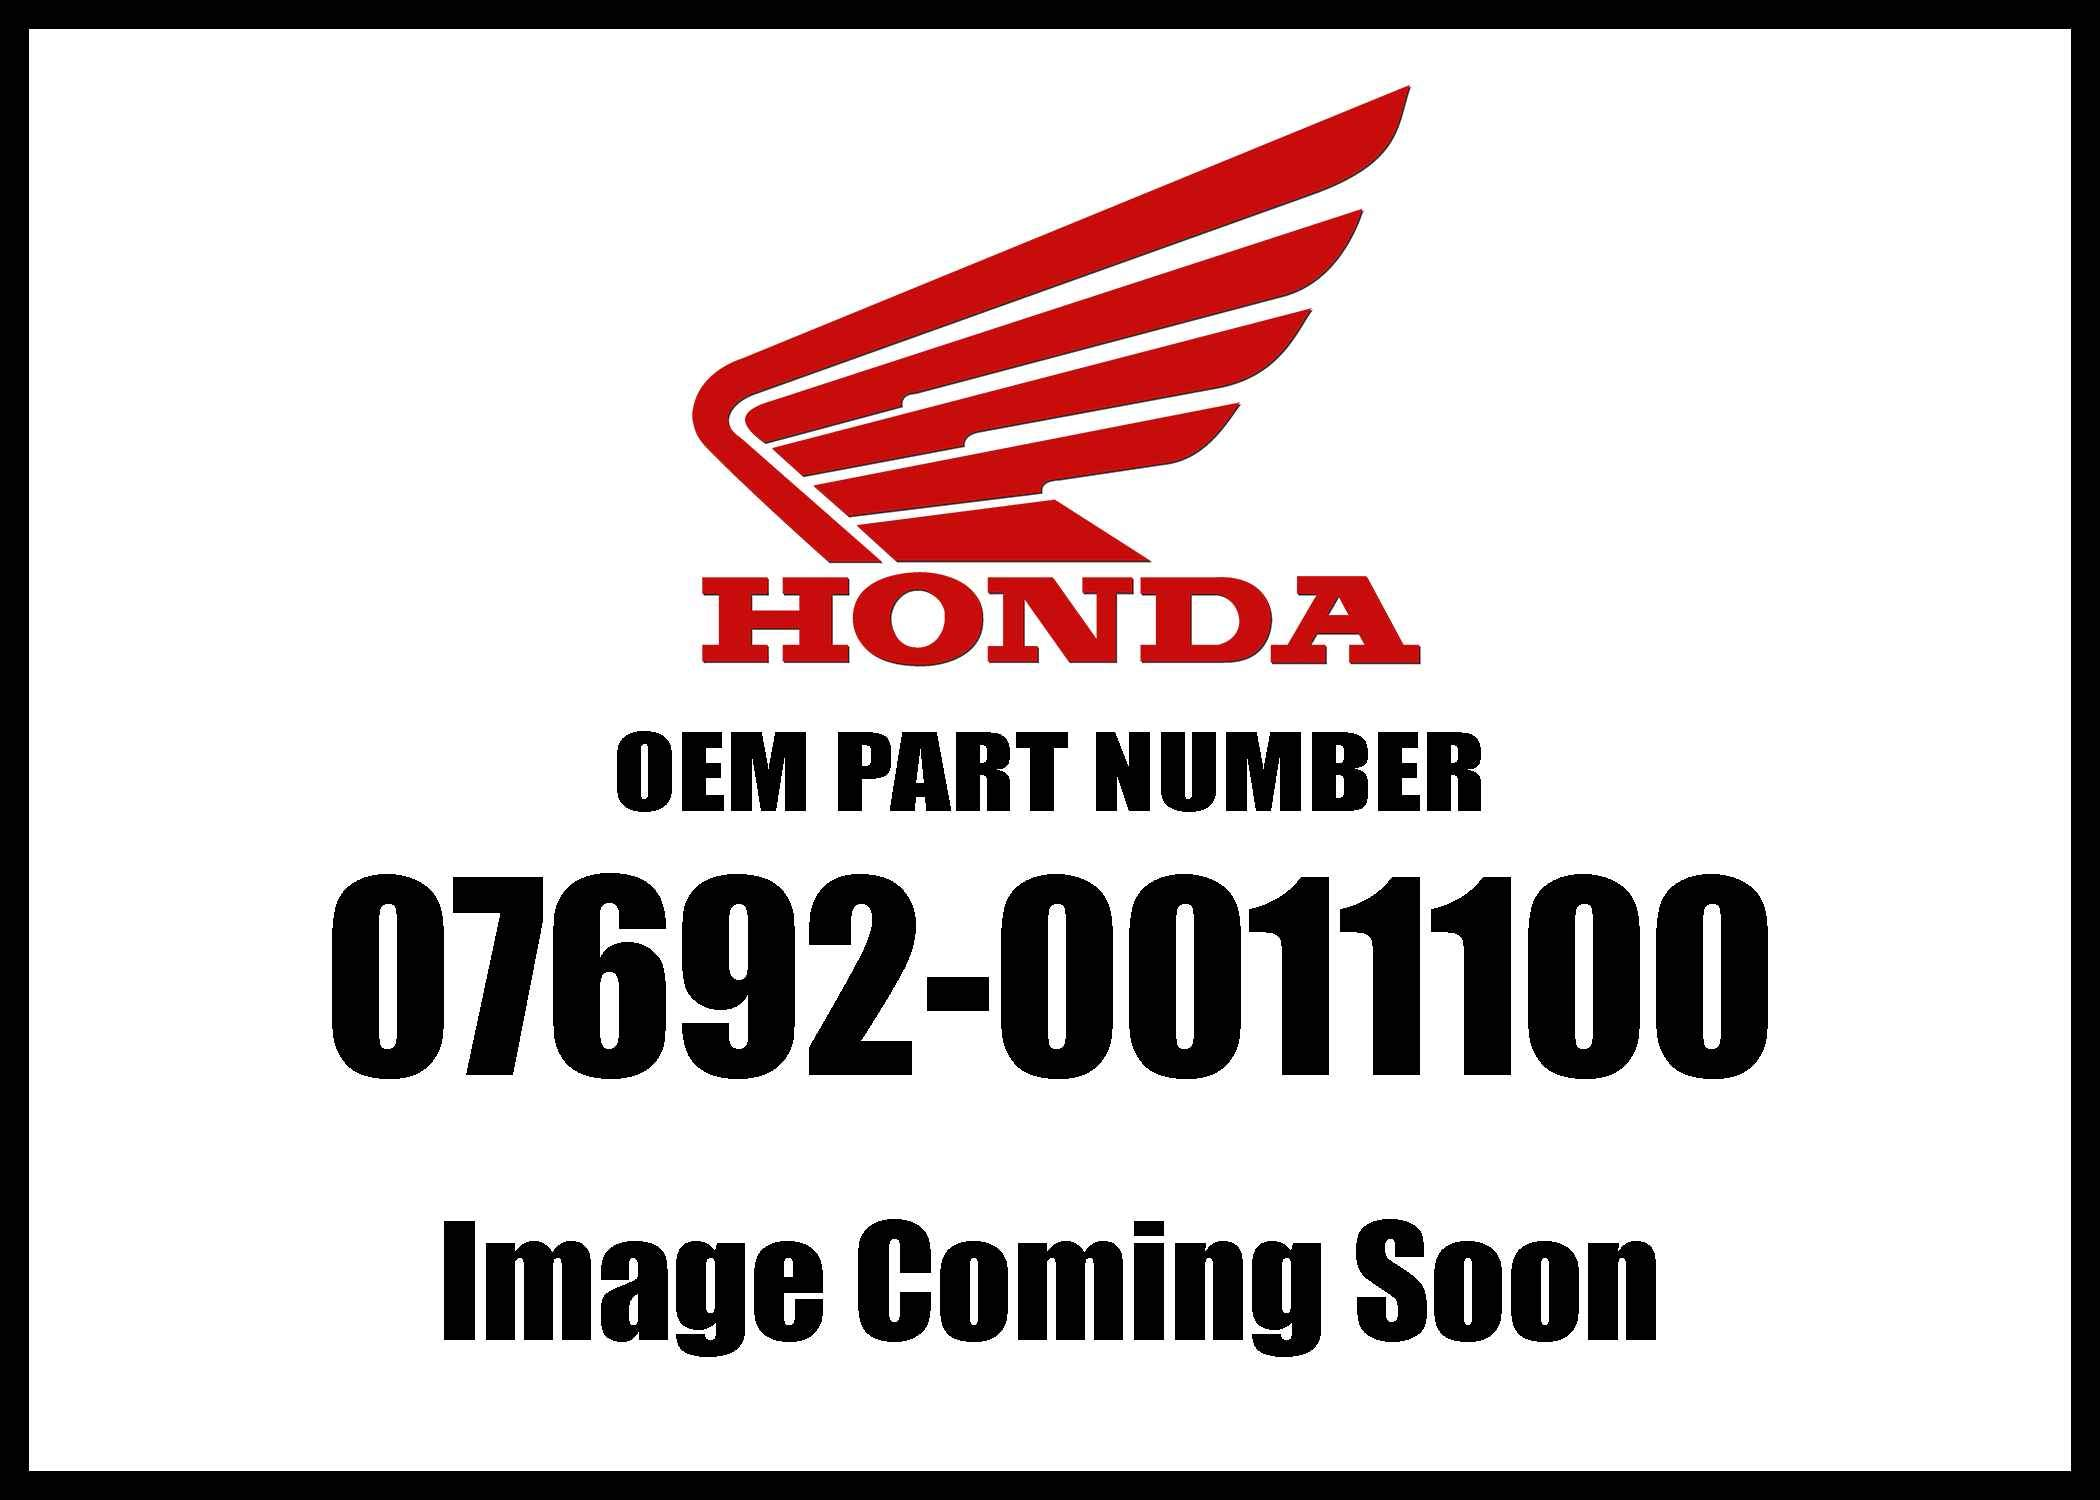 Honda 07692-0011100 Terminal Genuine Original Equipment Manufacturer (OEM) Part